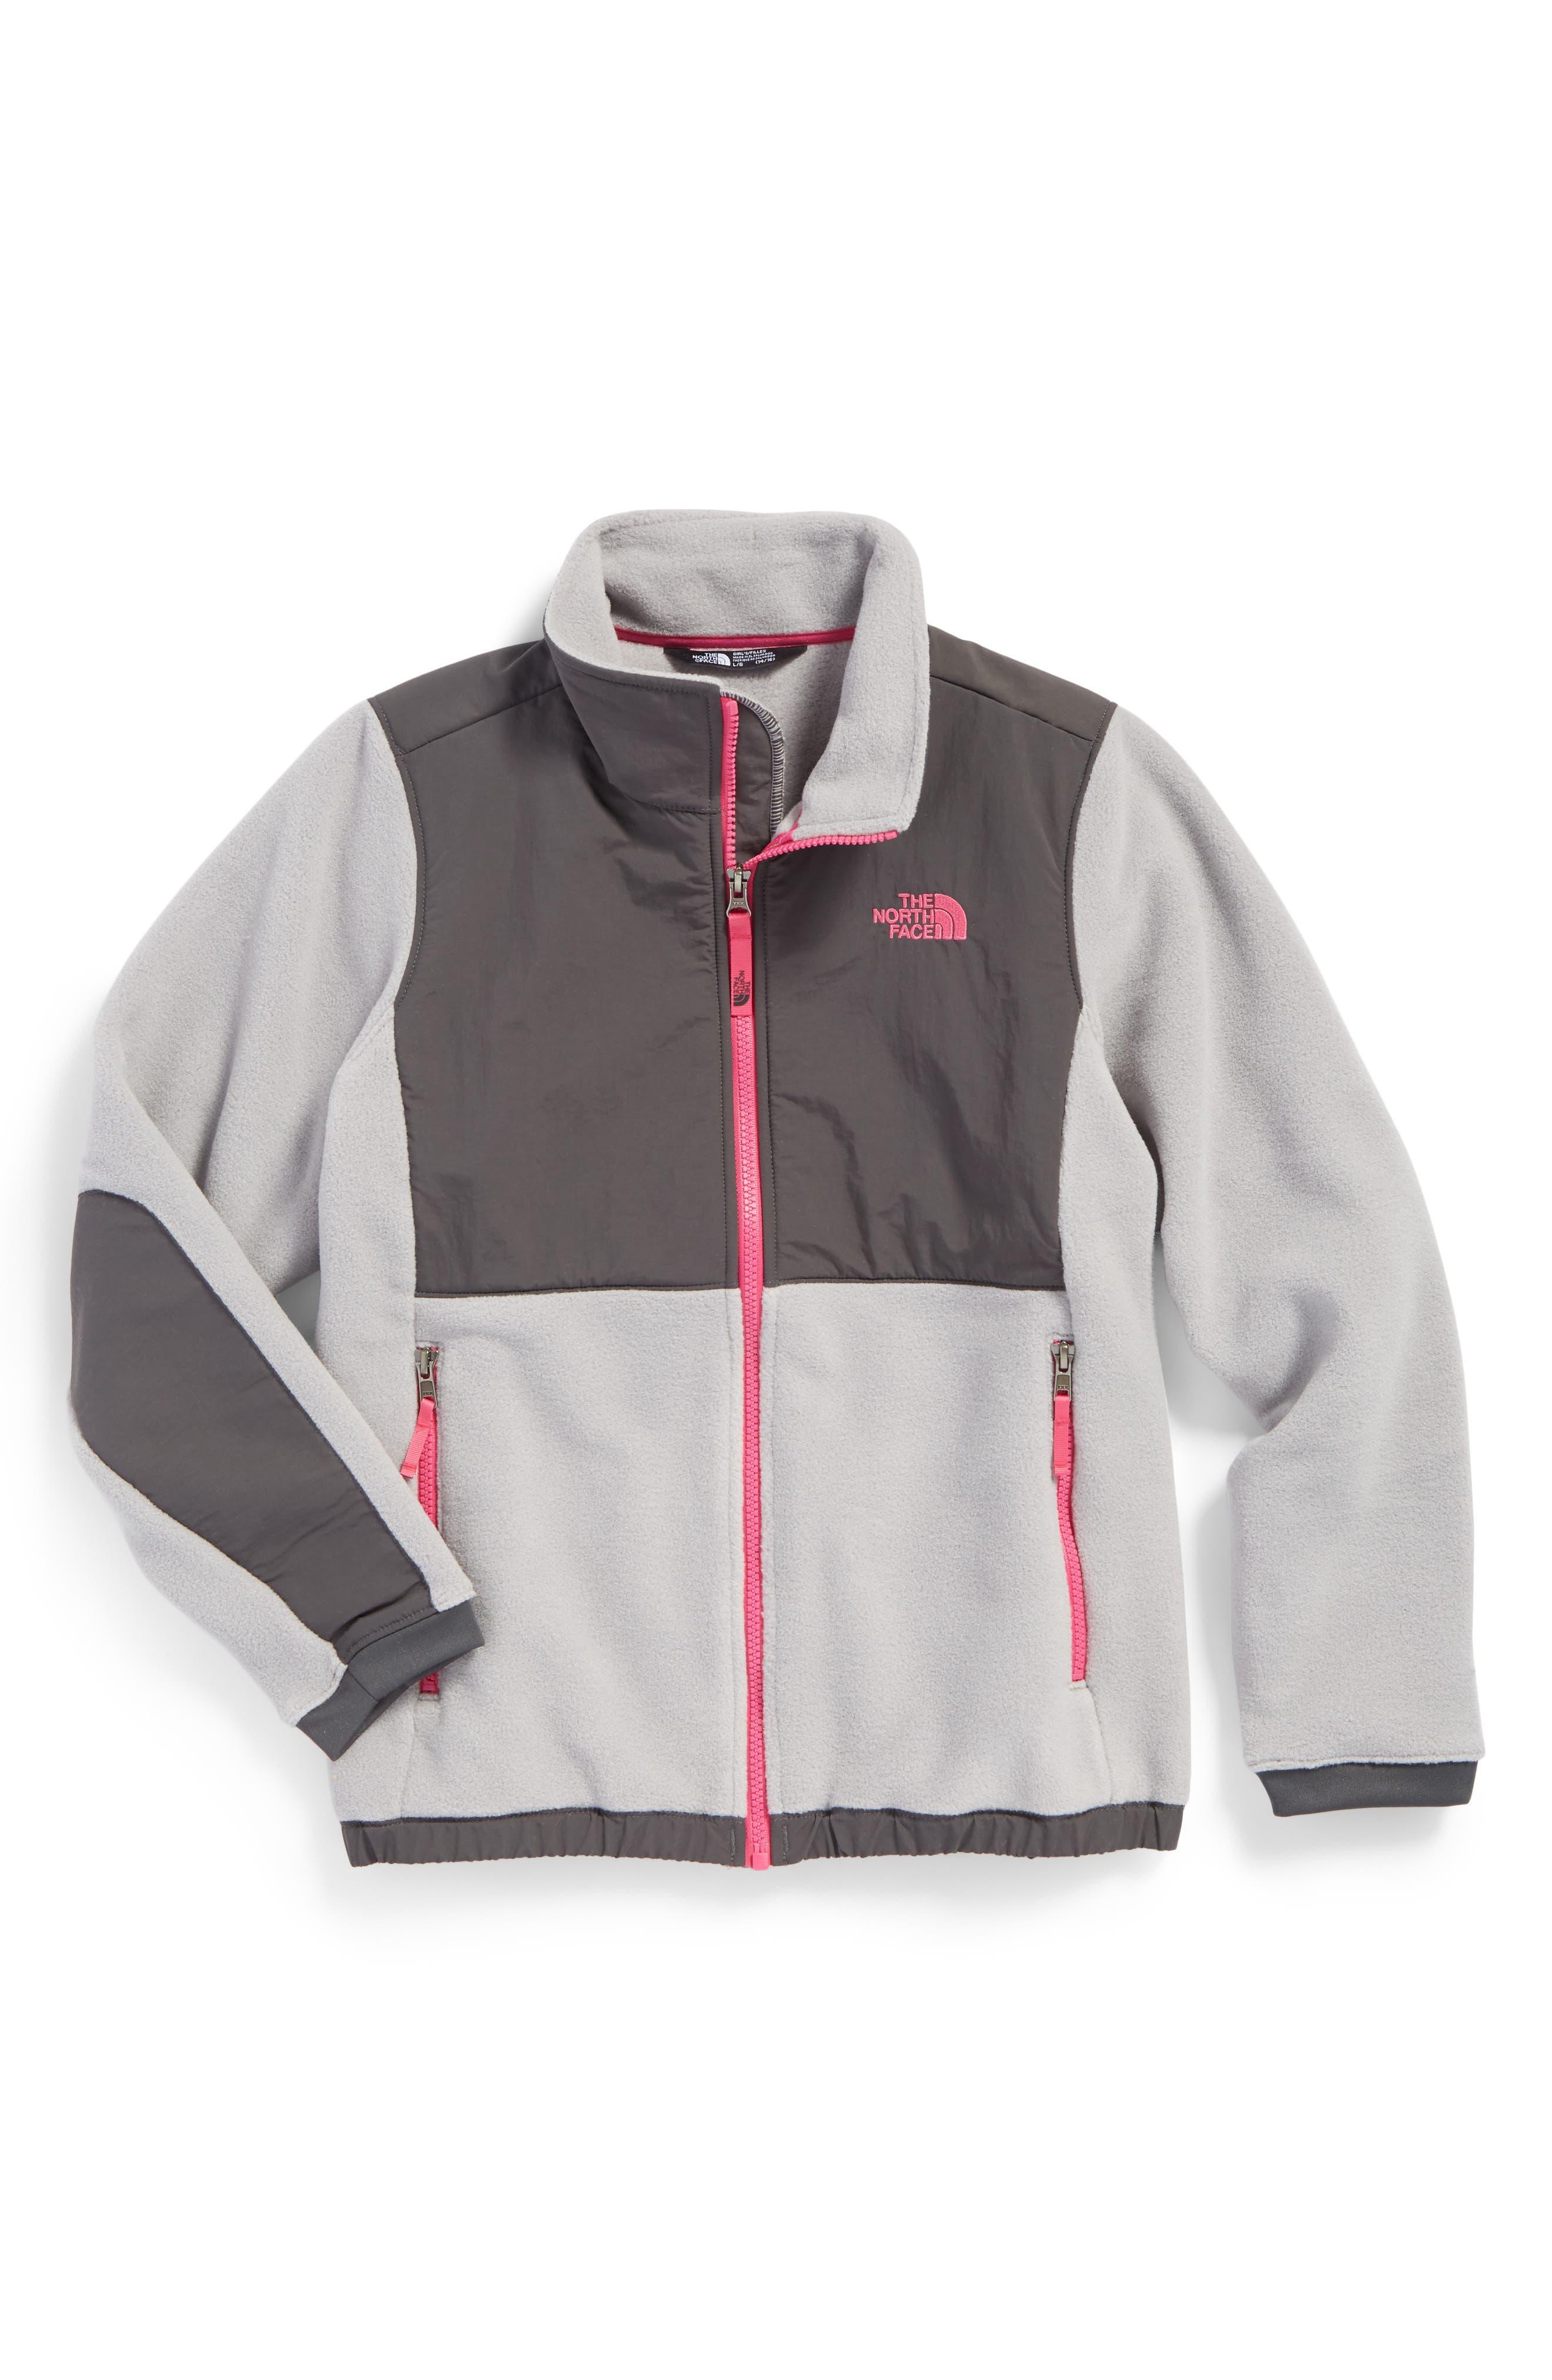 Denali Recycled Fleece Jacket,                             Main thumbnail 1, color,                             021